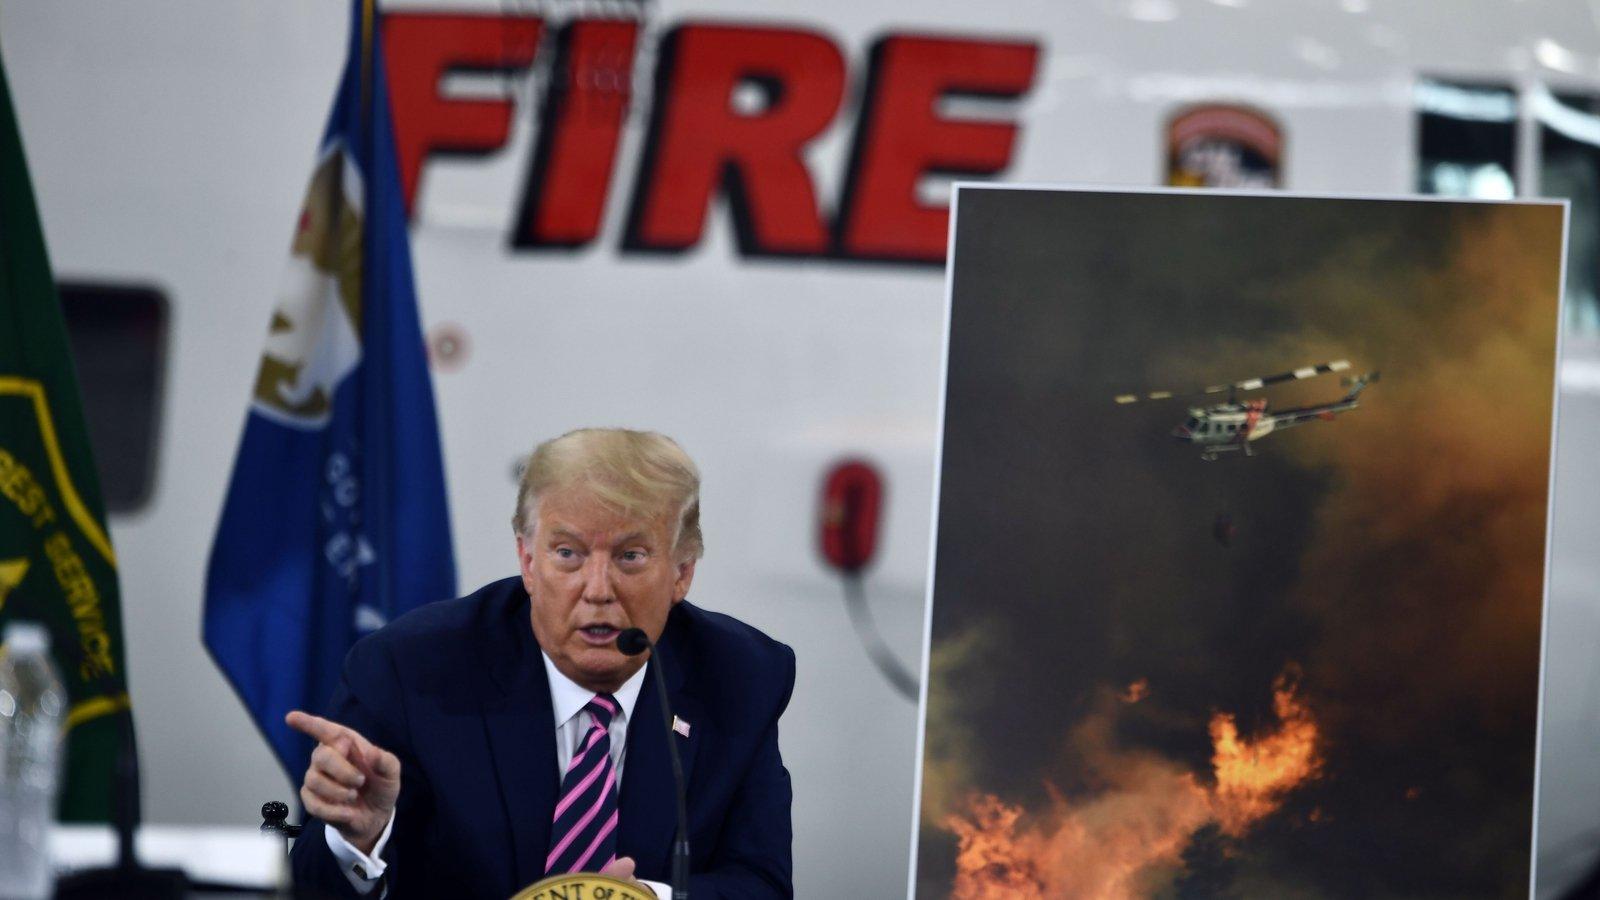 Global warming will reverse itself - Trump